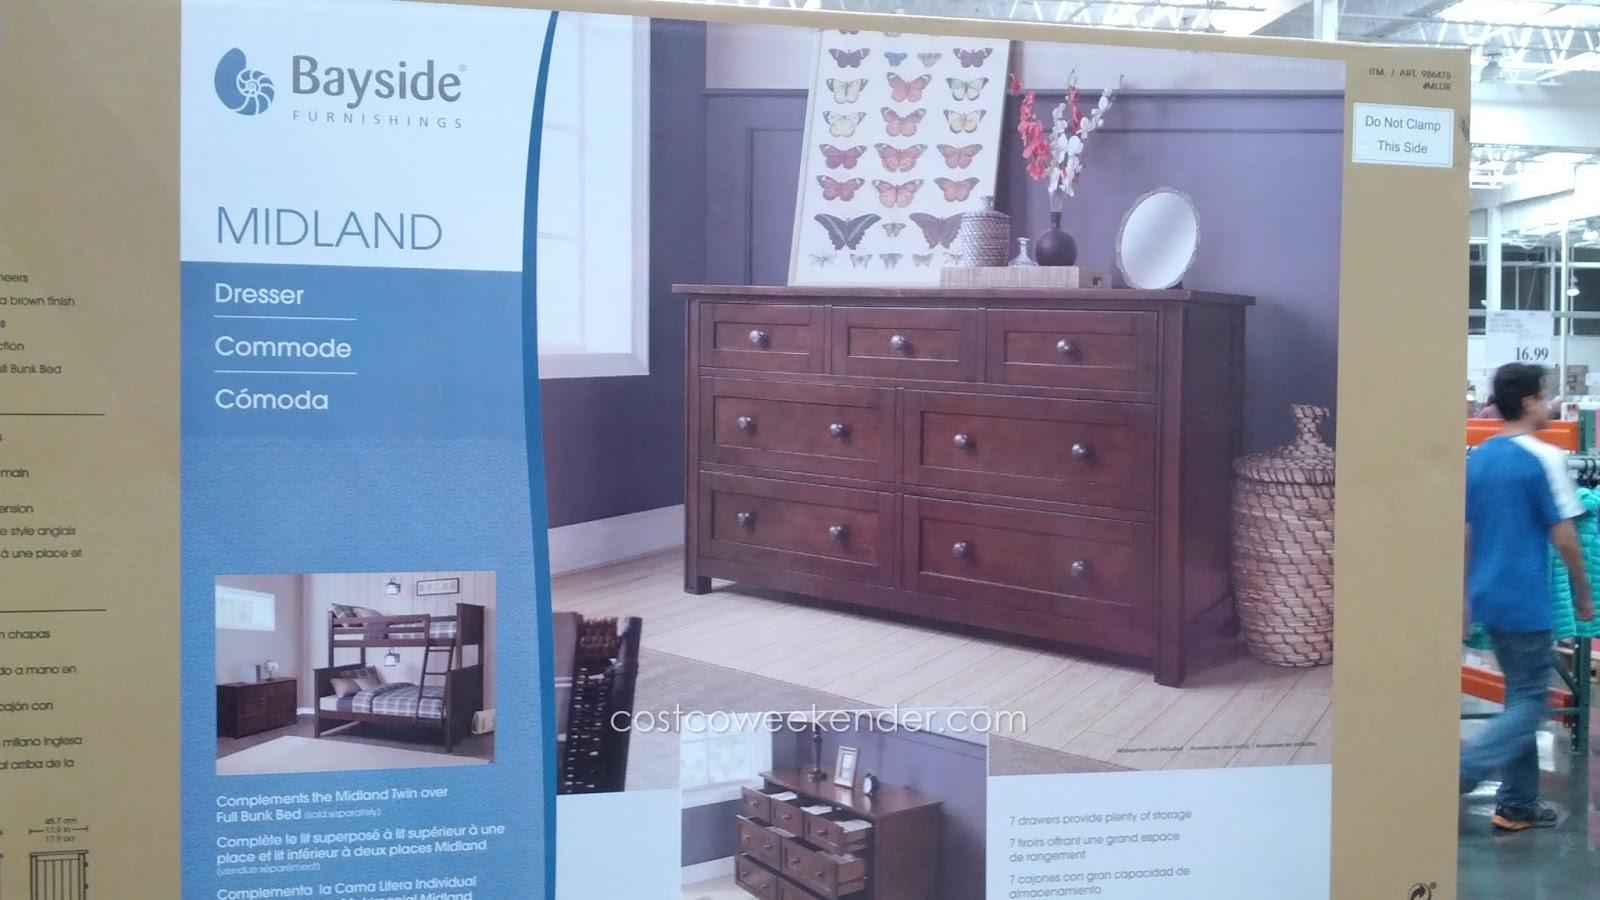 Bayside Furnishings Midland Dresser Costco Weekender